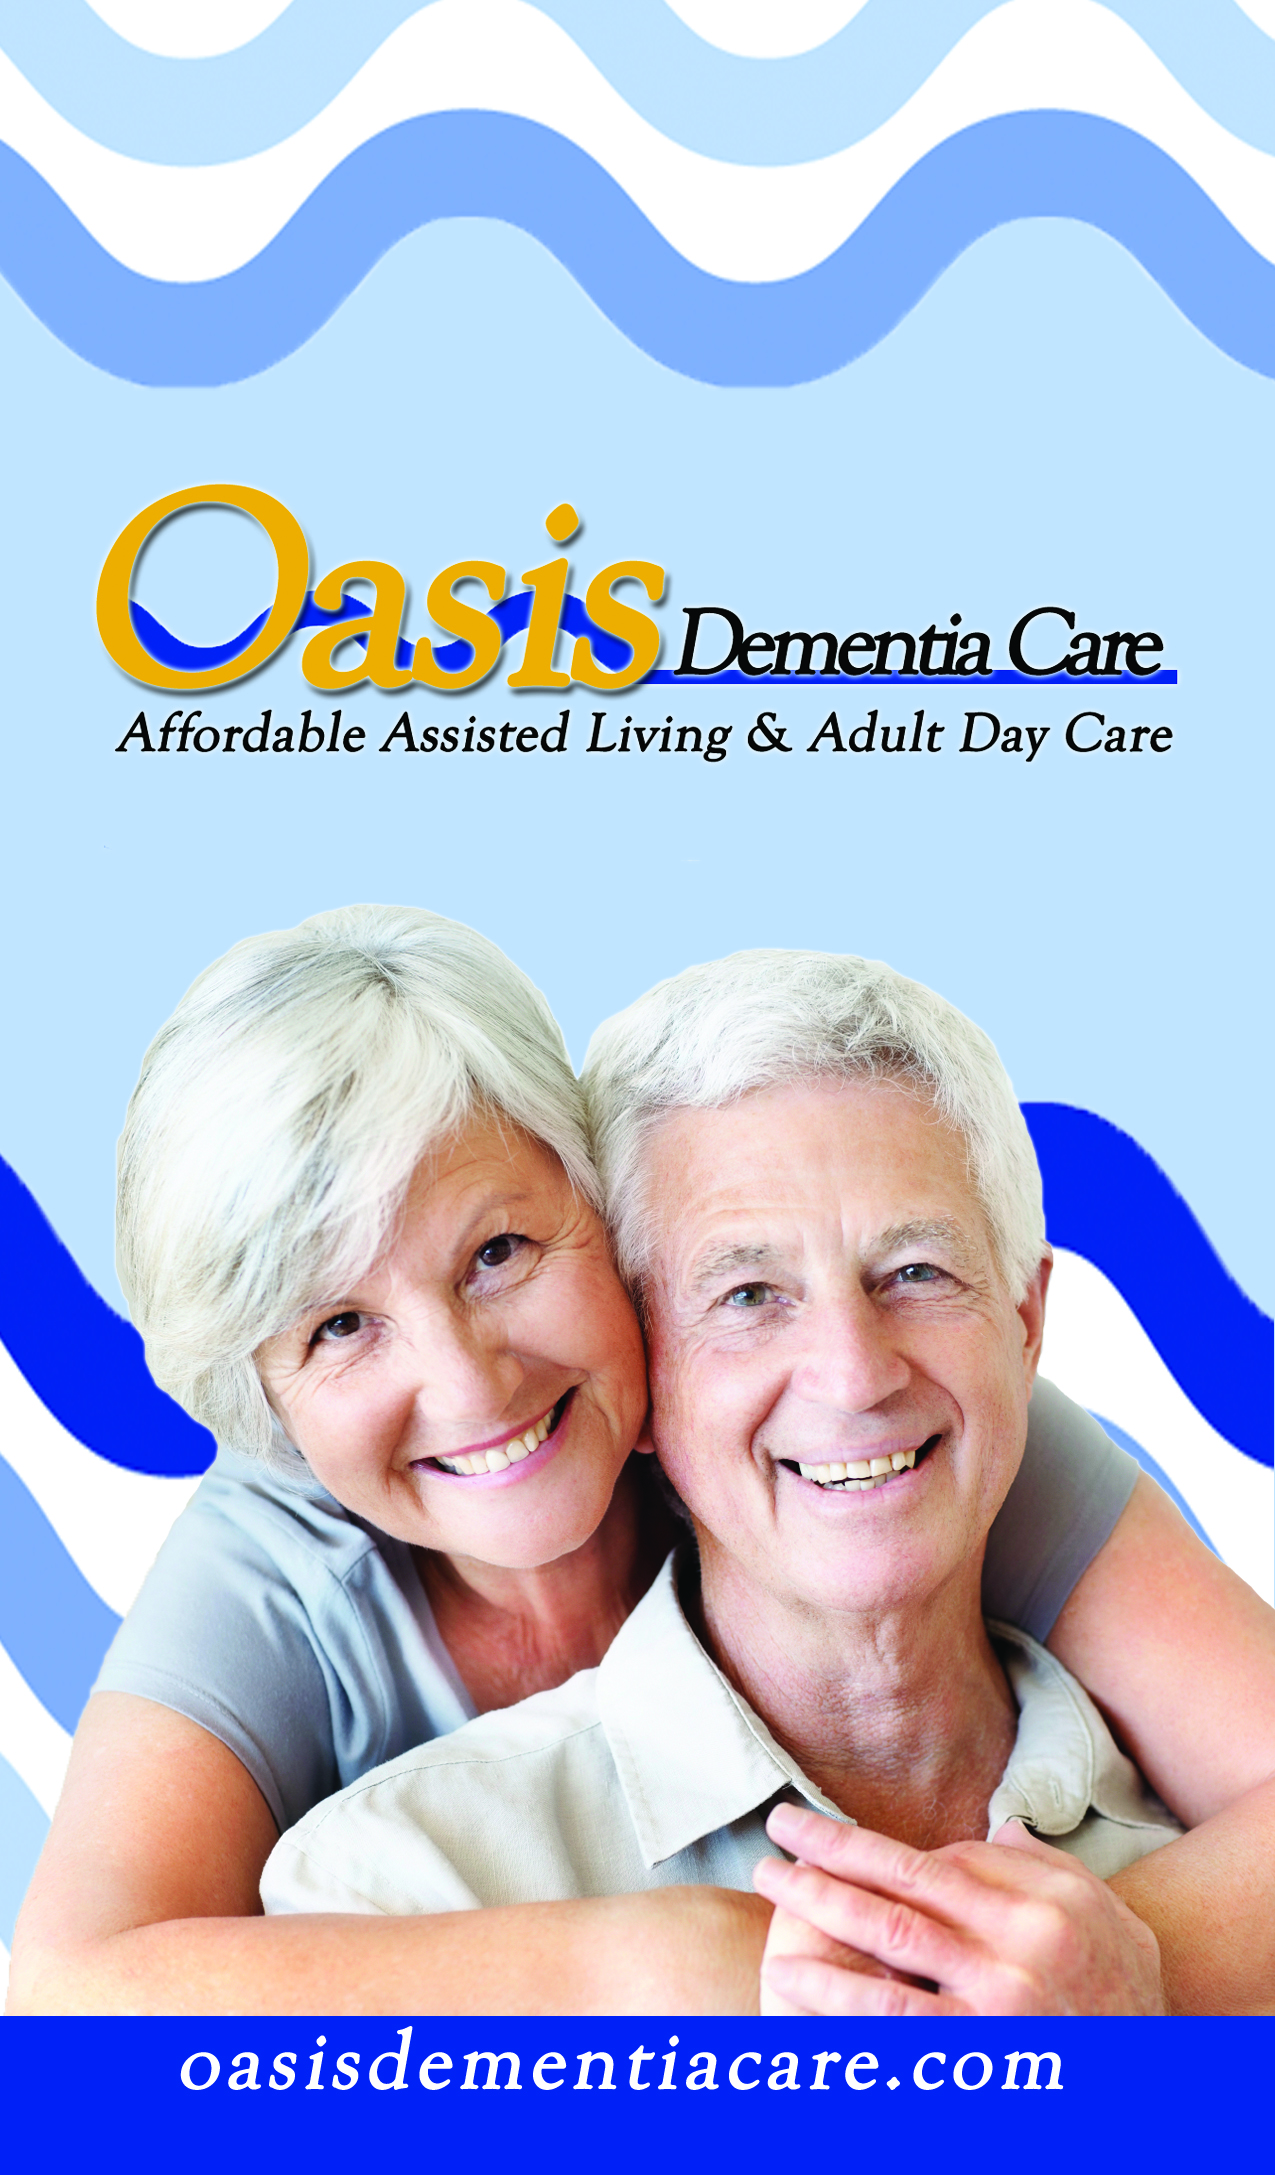 Oasis Dementia Care